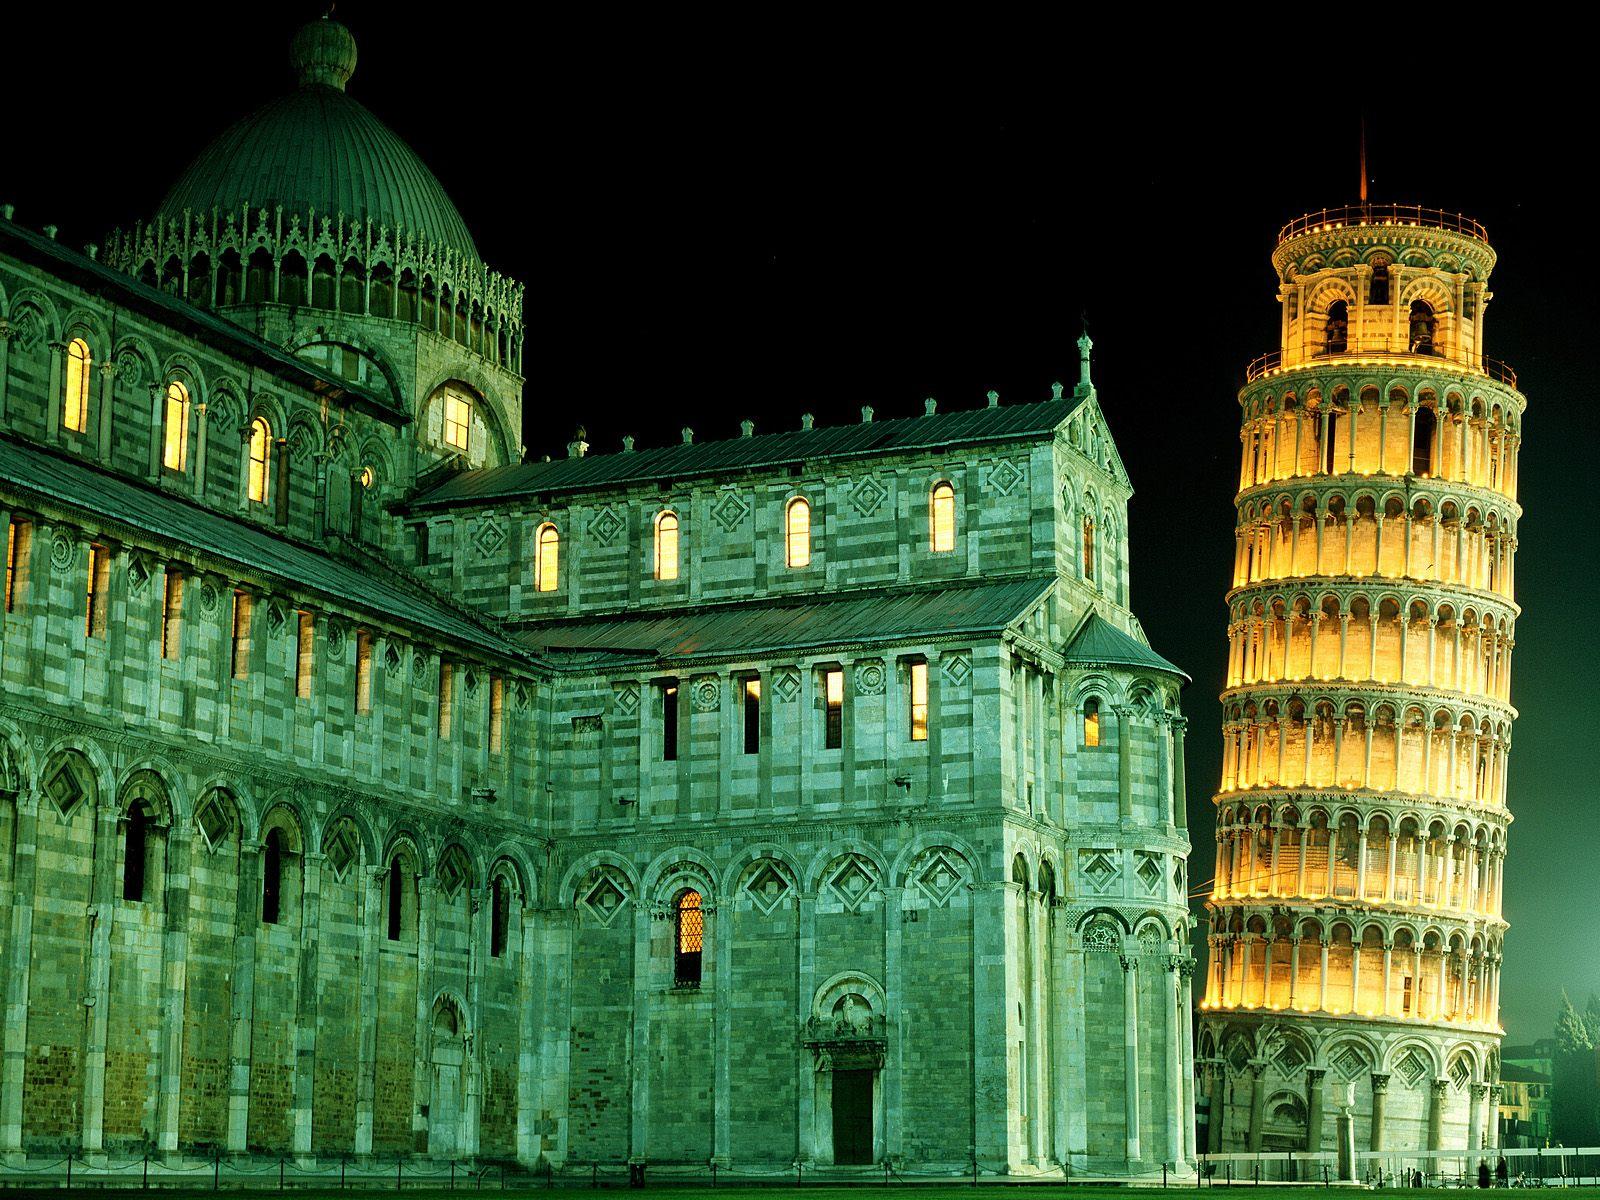 Duomo Leaning Tower Pisa Italy wallpaper